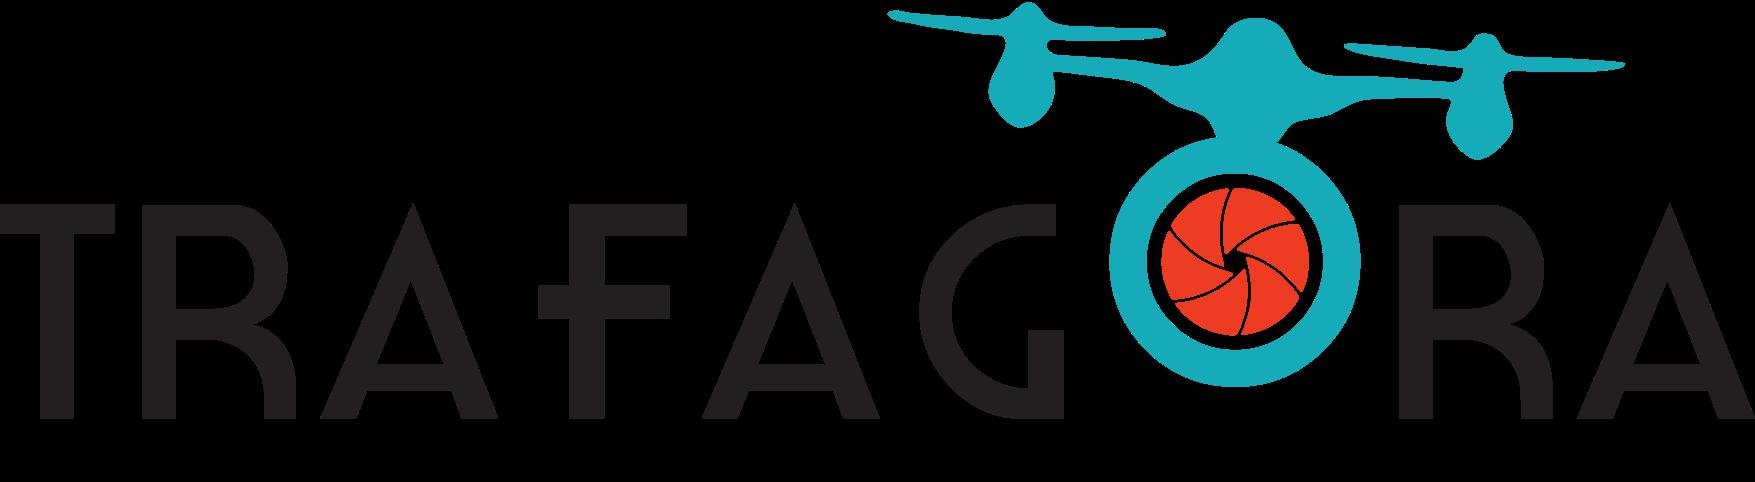 Trafagora